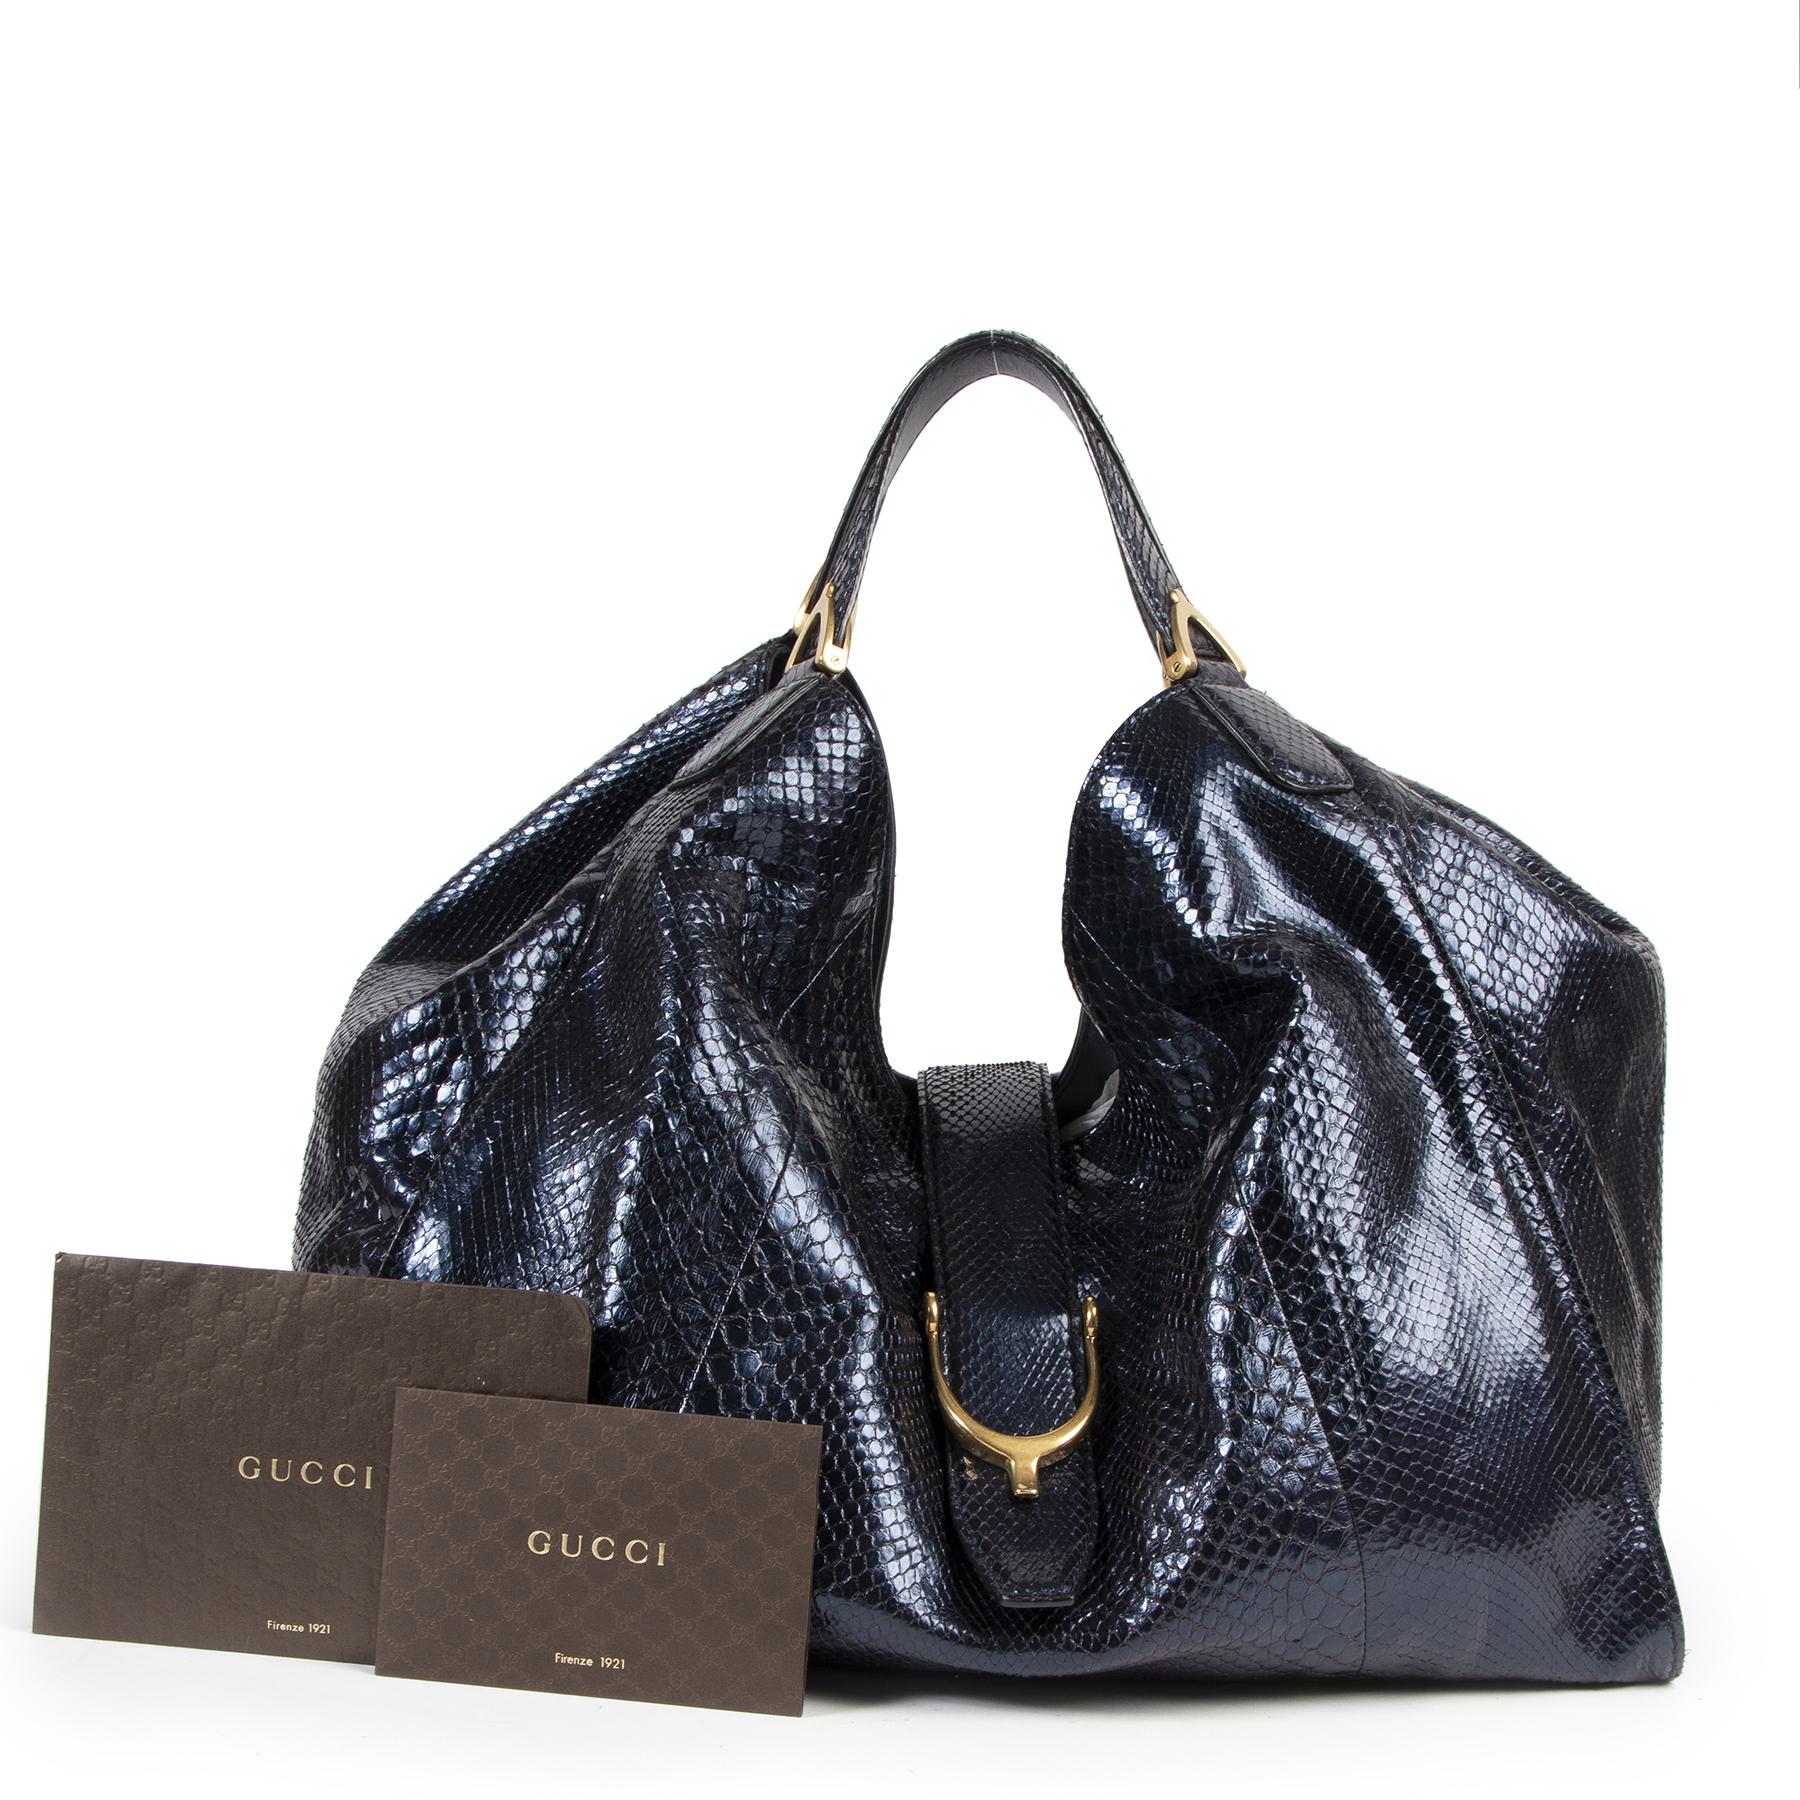 Authentic secondhand Gucci Metallic Blue Python Soft Stirrup Tote Bag designer bags fashion luxury vintage webshop safe secure online shopping